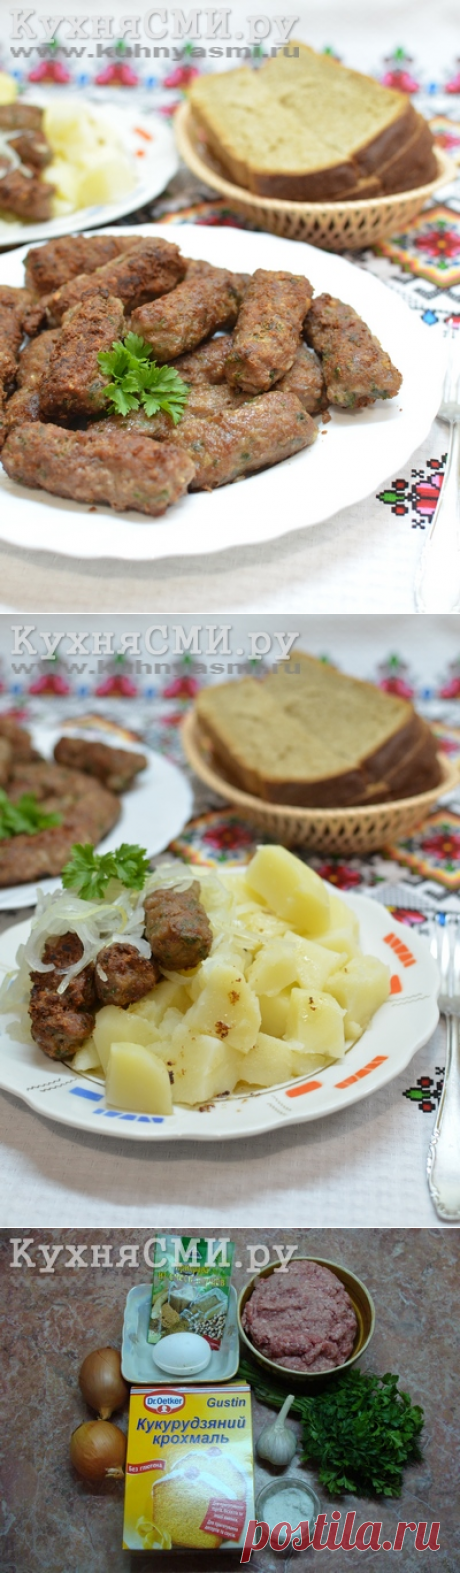 Чевапчичи - сербские колбаски